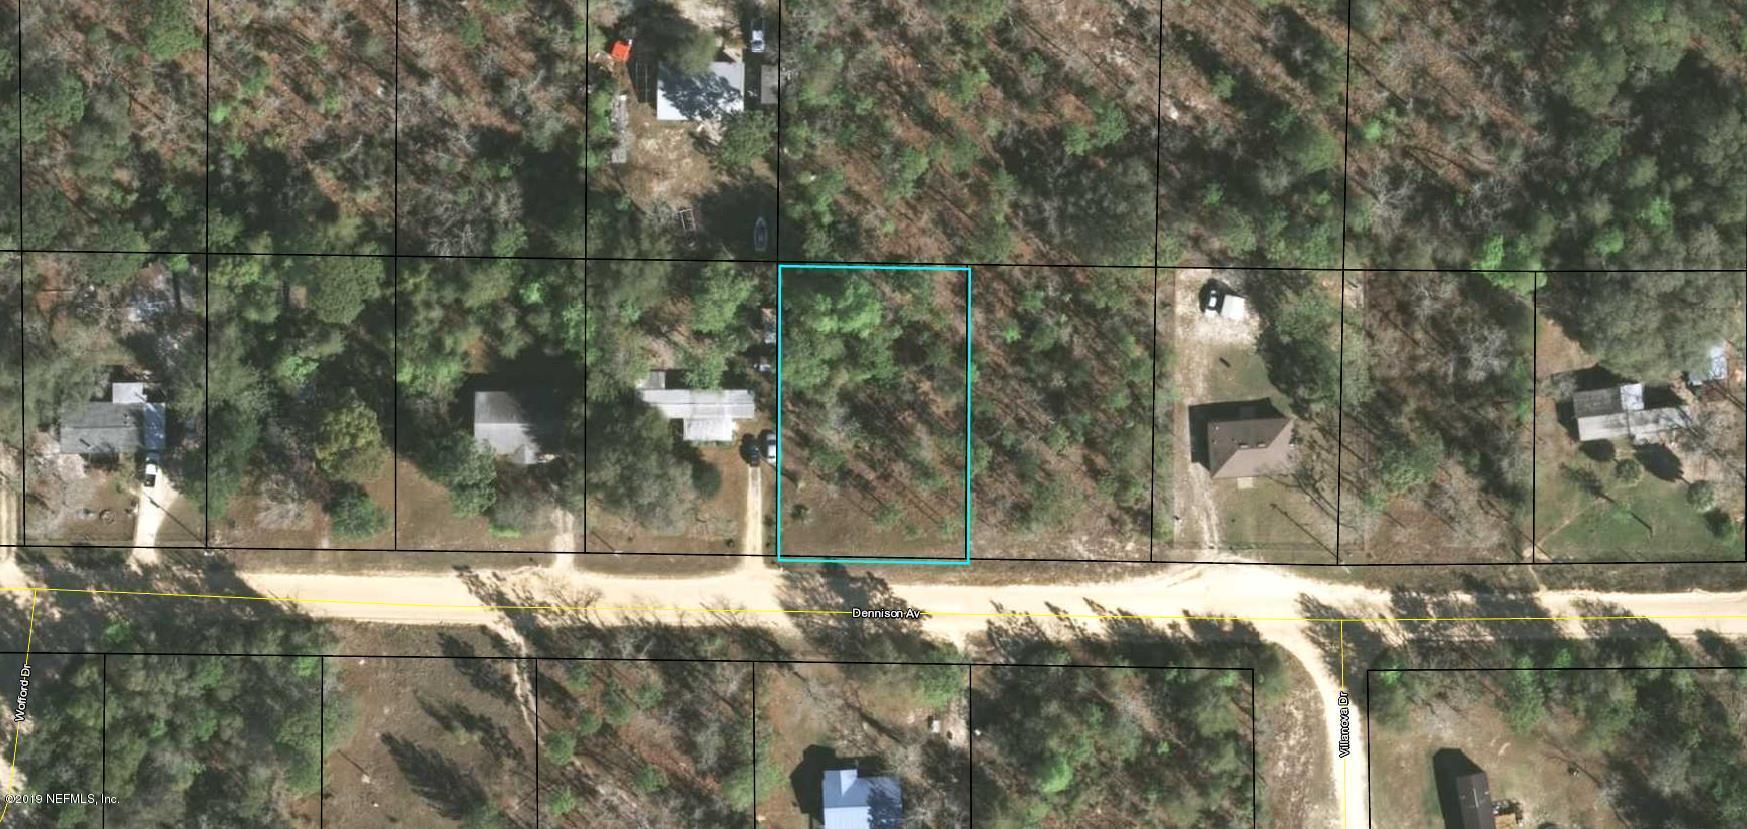 0 DENNISON, KEYSTONE HEIGHTS, FLORIDA 32656, ,Vacant land,For sale,DENNISON,979184